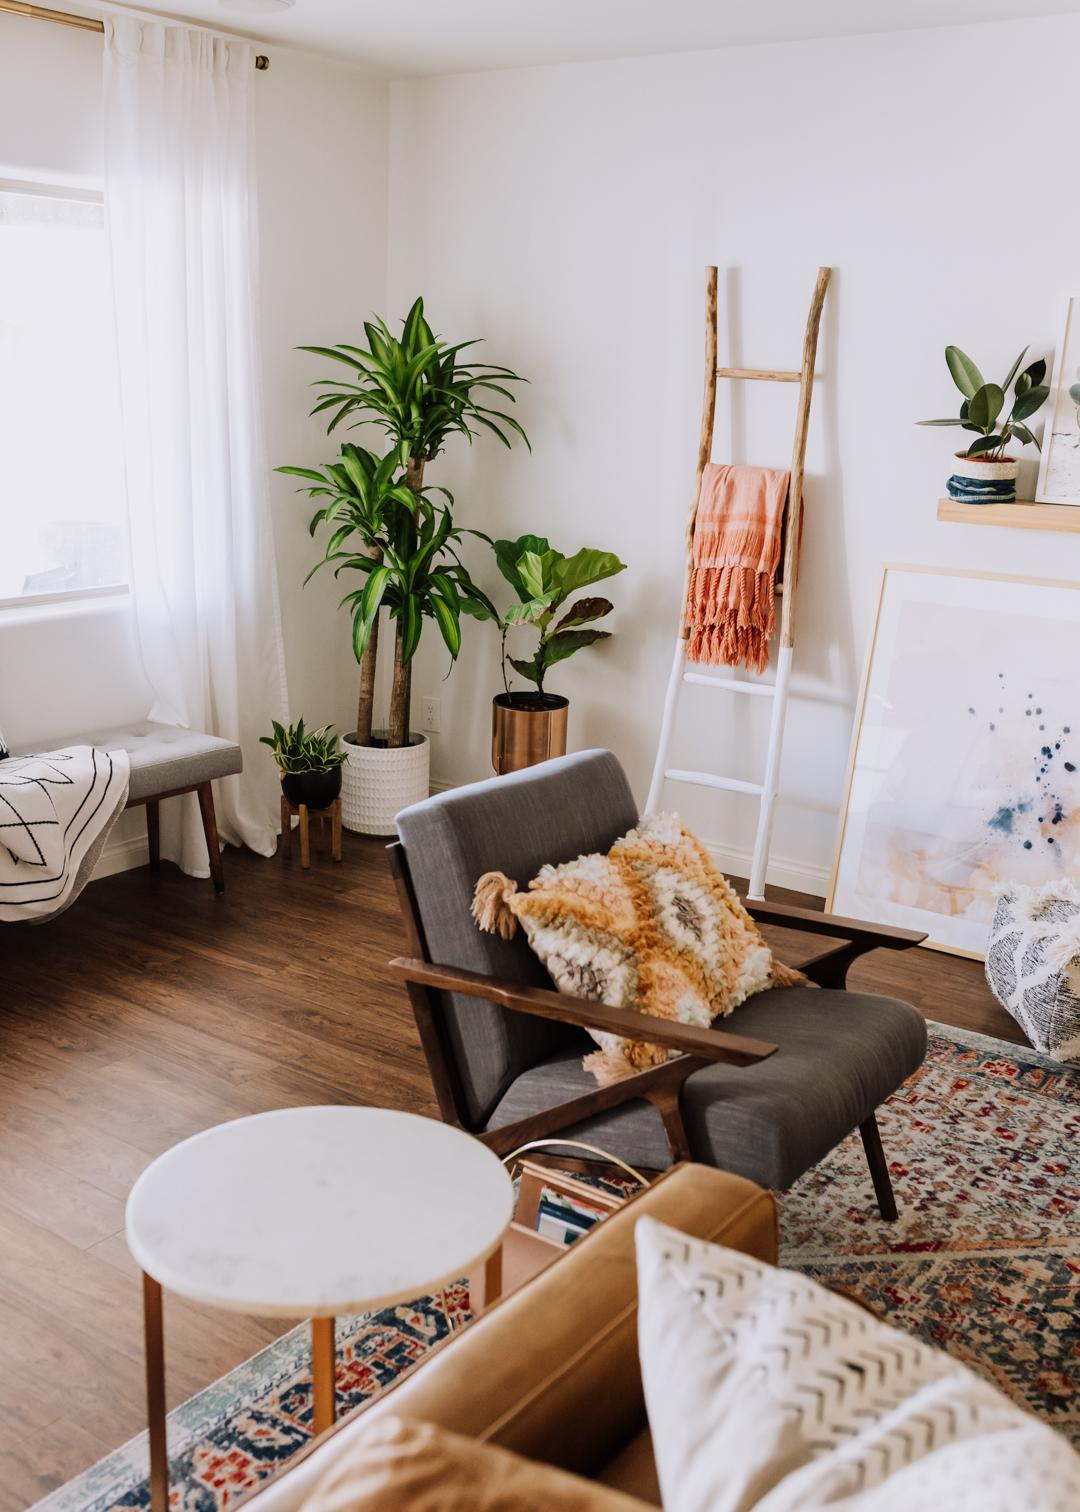 pretty modern boho living room | thelovedesignedlife.com #livingroom #midcenturymodern #bohomodern